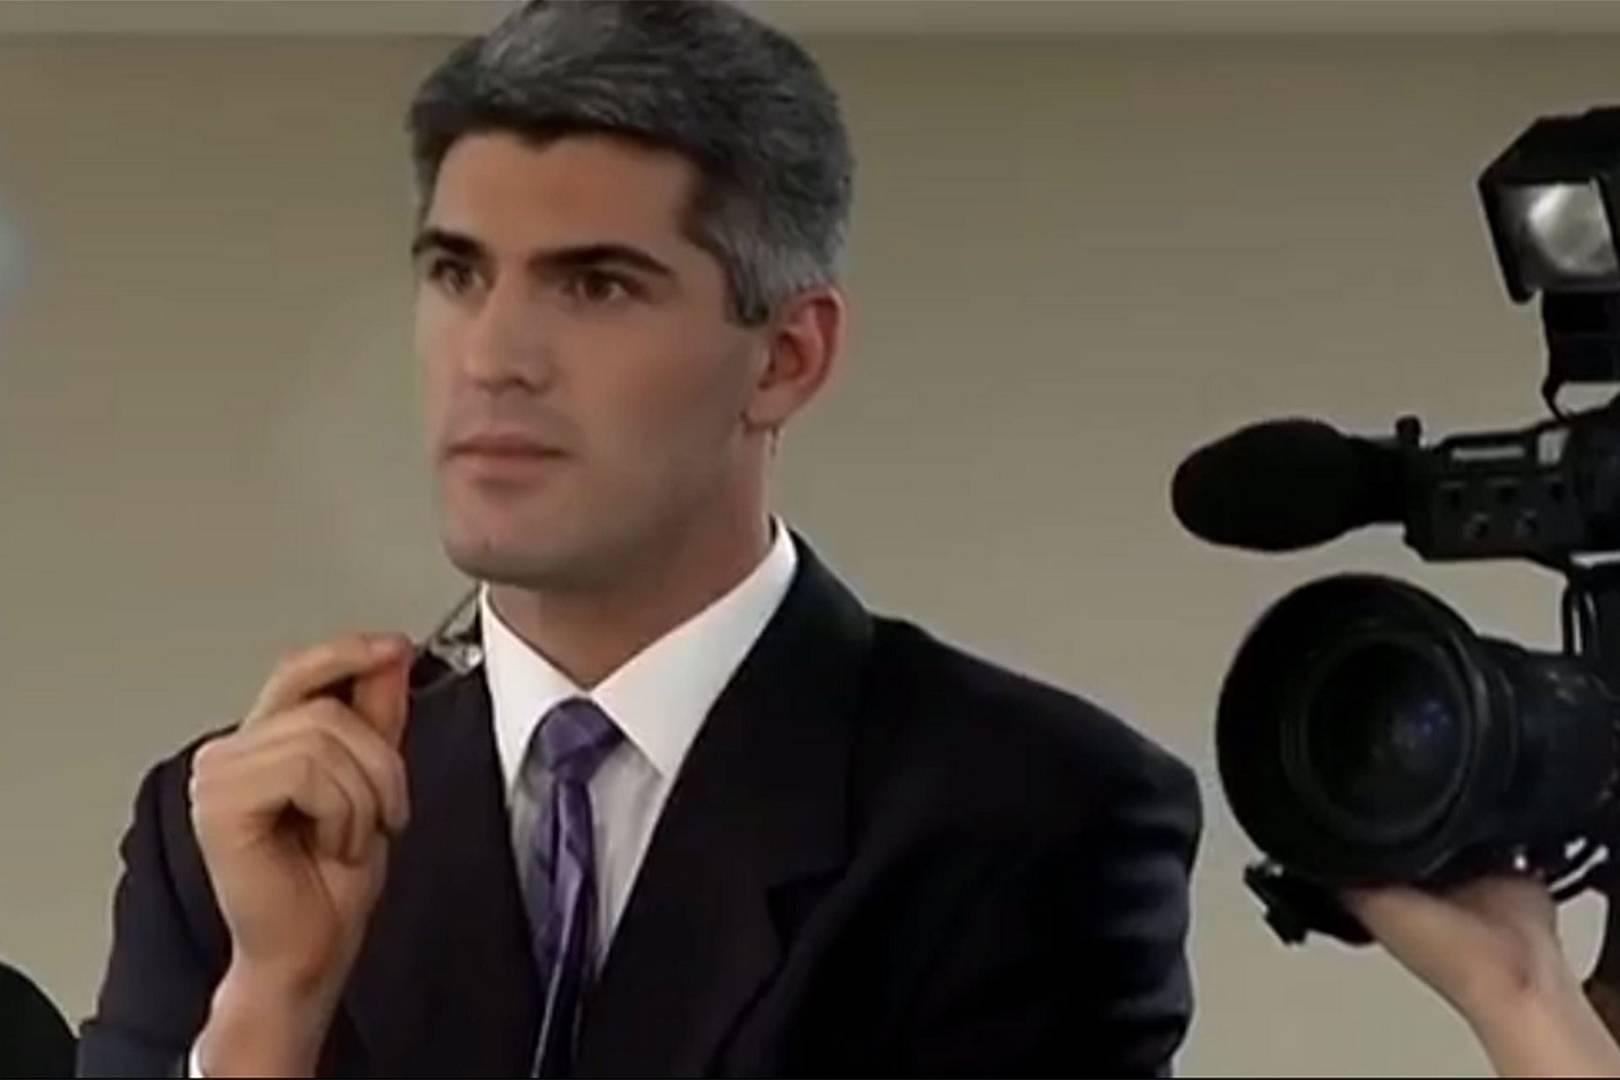 making a murderer netflix show - silver fox grey-haired reporter